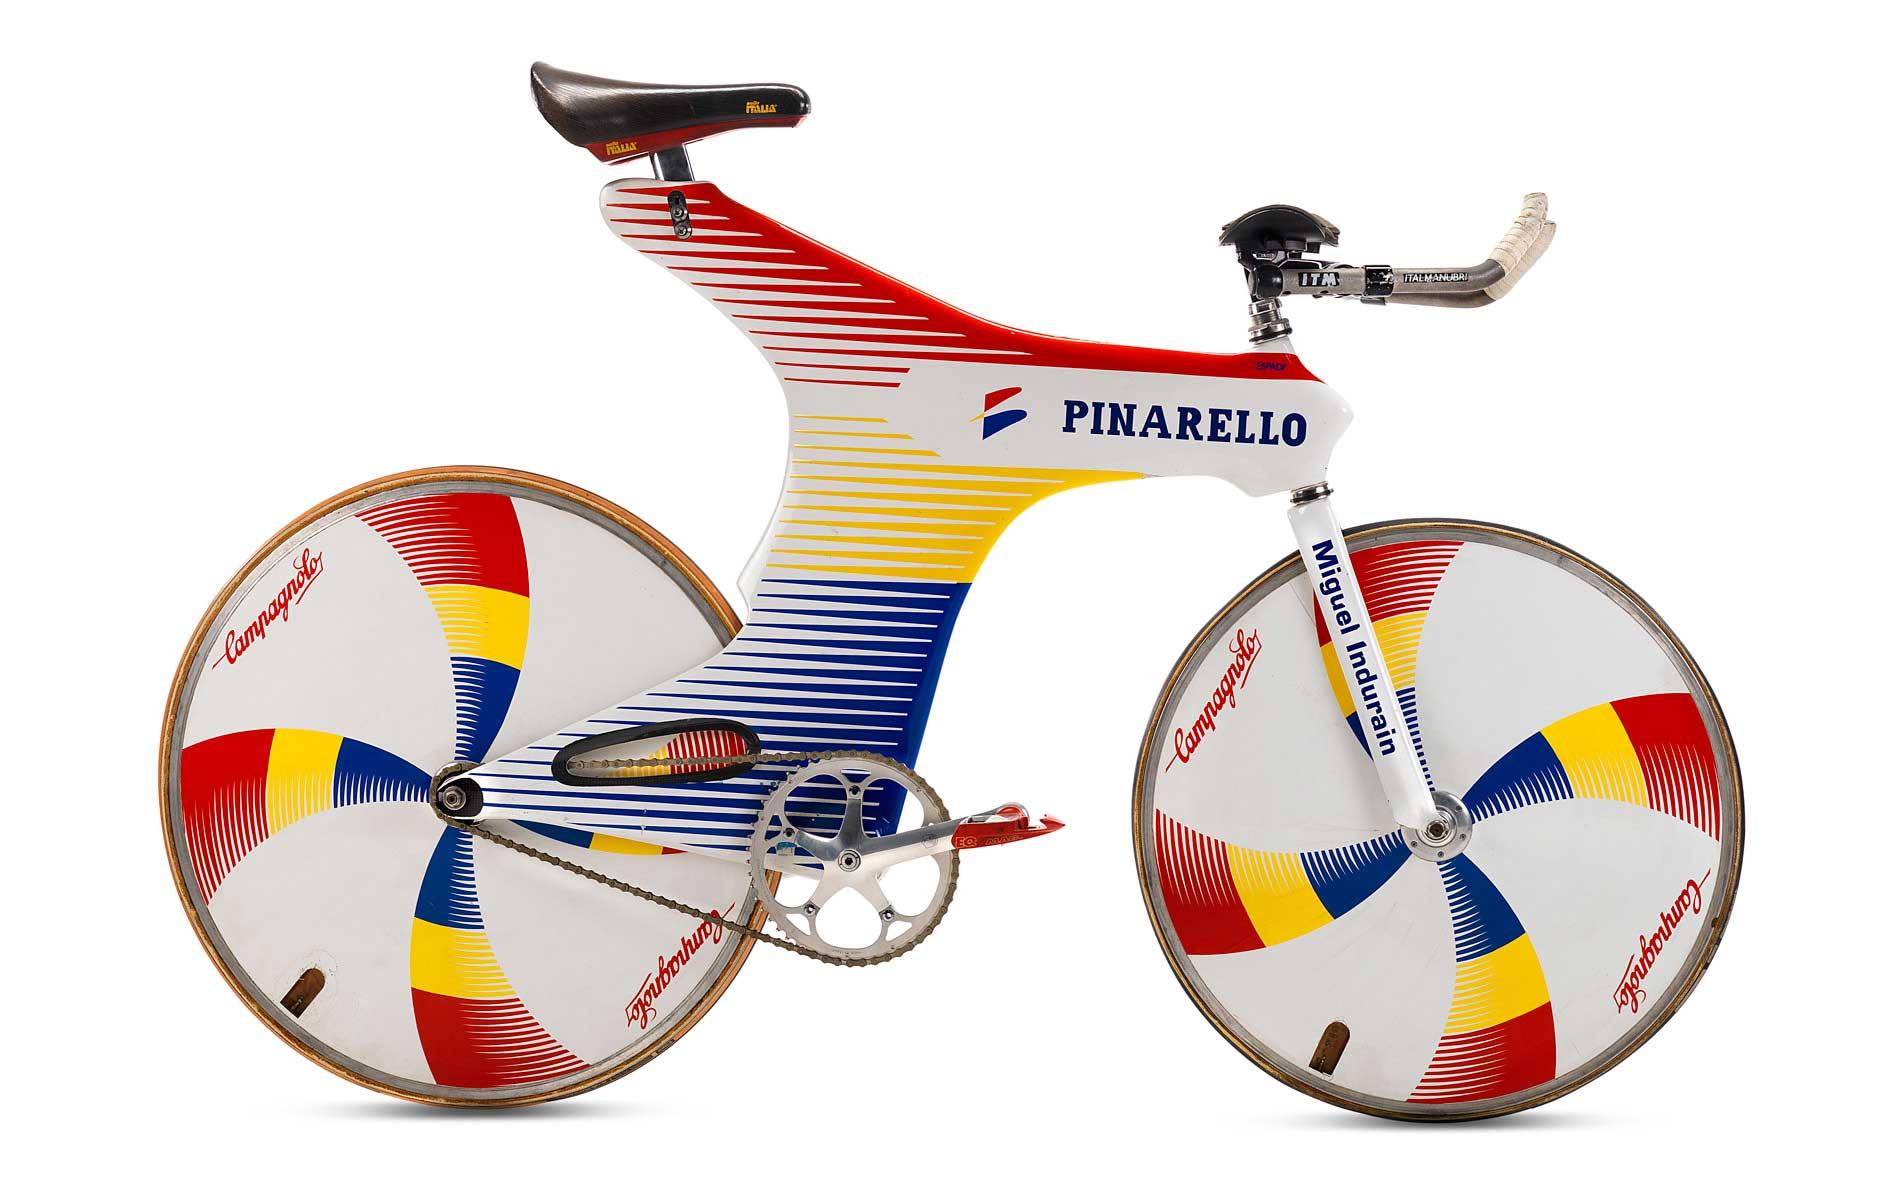 Miguel Indurain's Pinarello Espada Track and (later) Time Trial bike (1994)